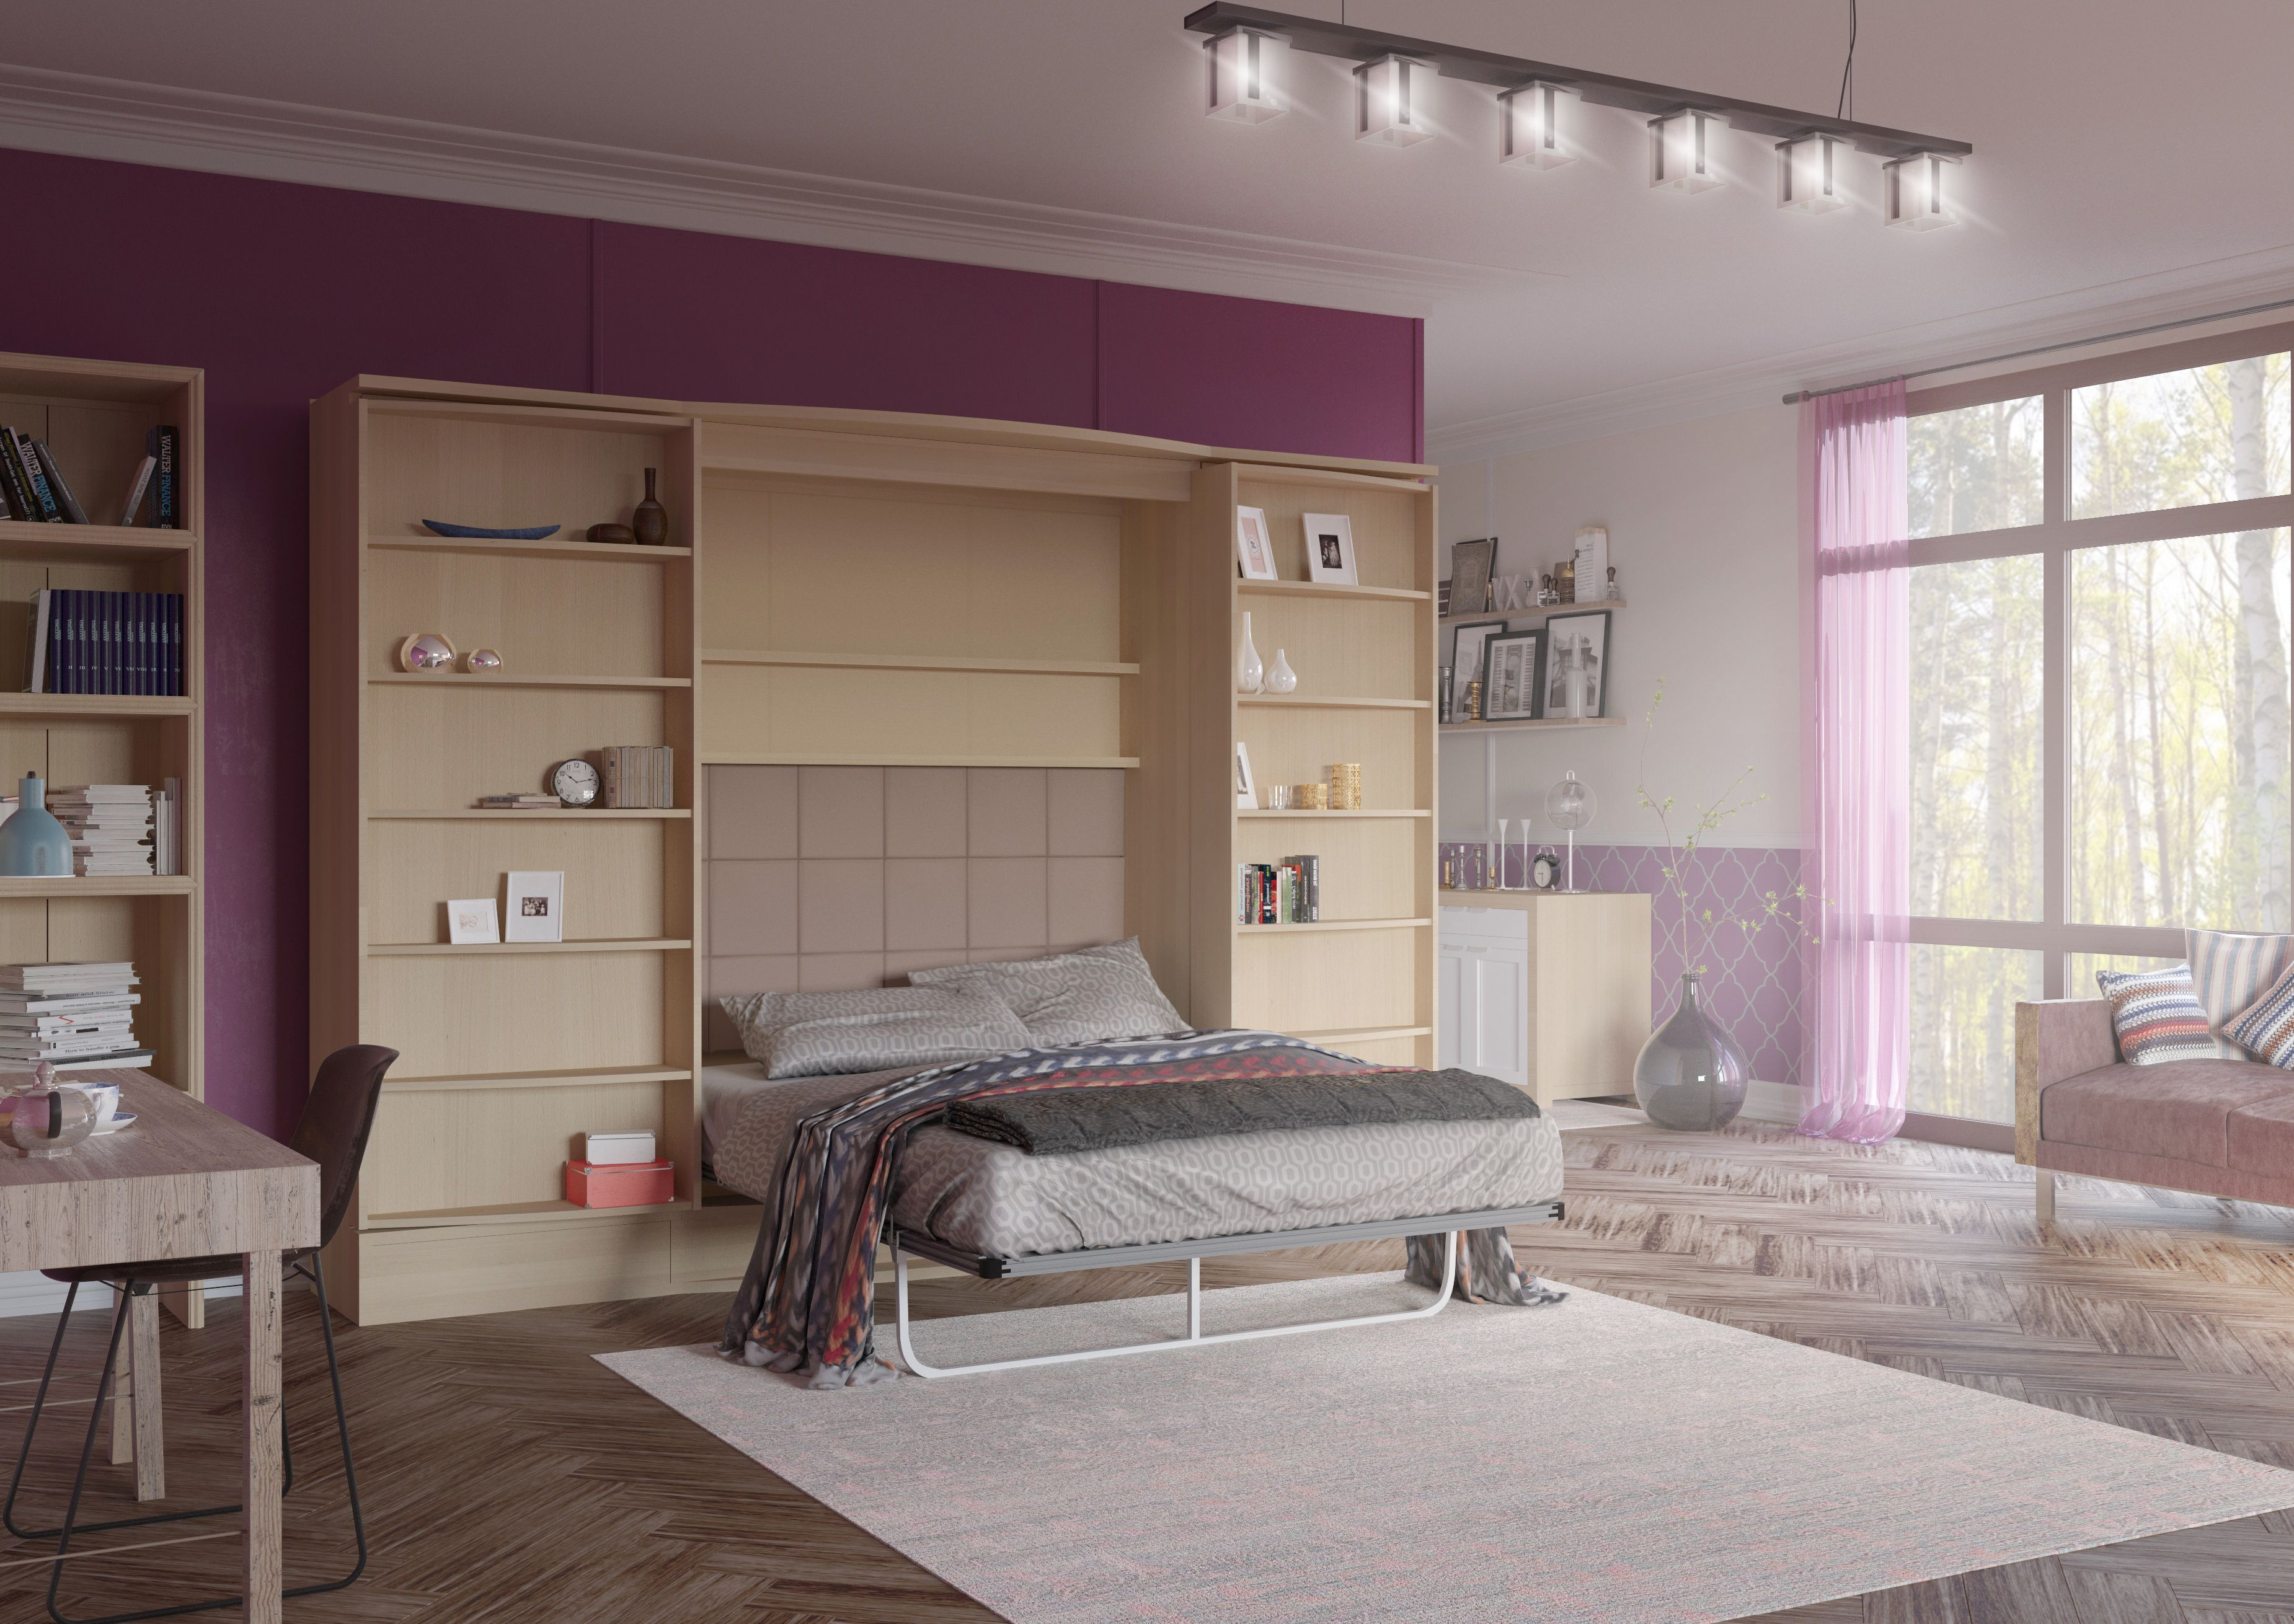 Hidden Murphy Bed Wall Bed within a modern bookshelf Perfect for